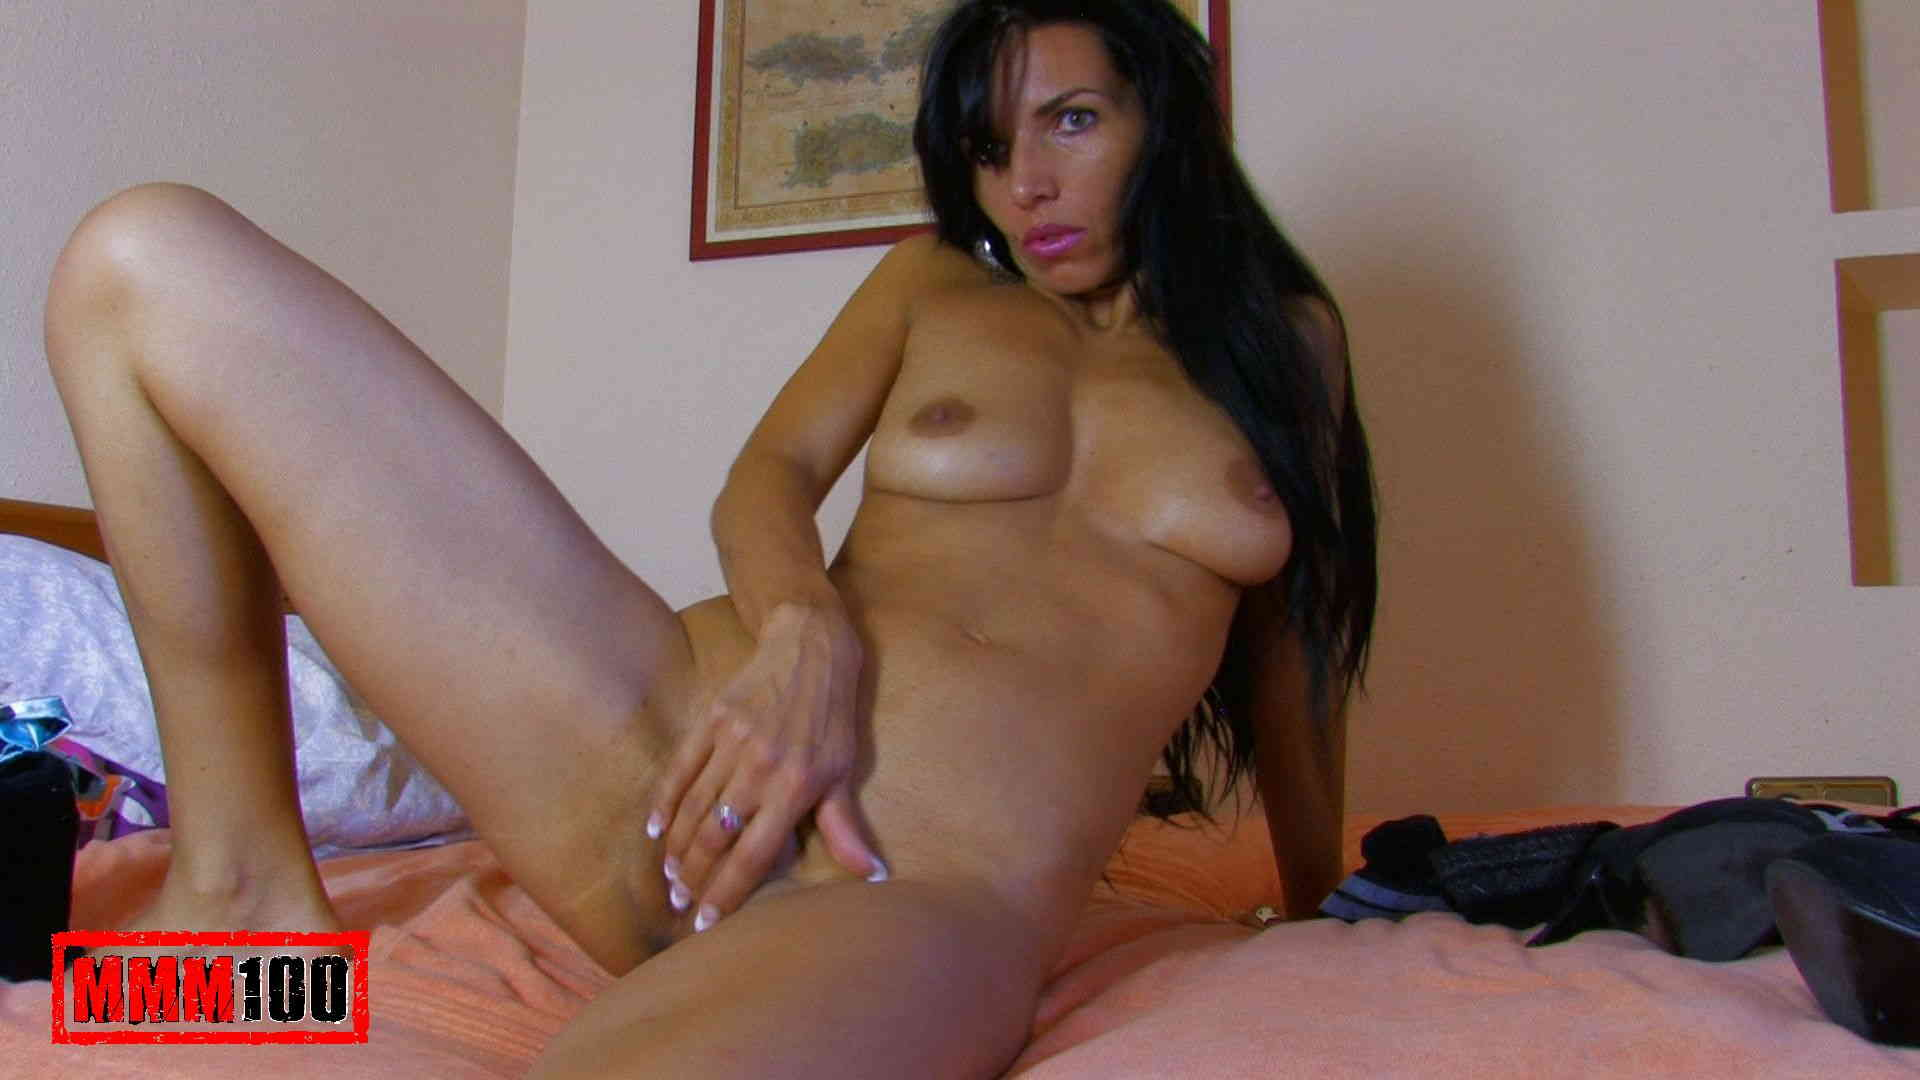 Maturenl Bettina Leaked Milfsex Thehun Milf Vip Porn Pic Sex Photo Xxx Picture